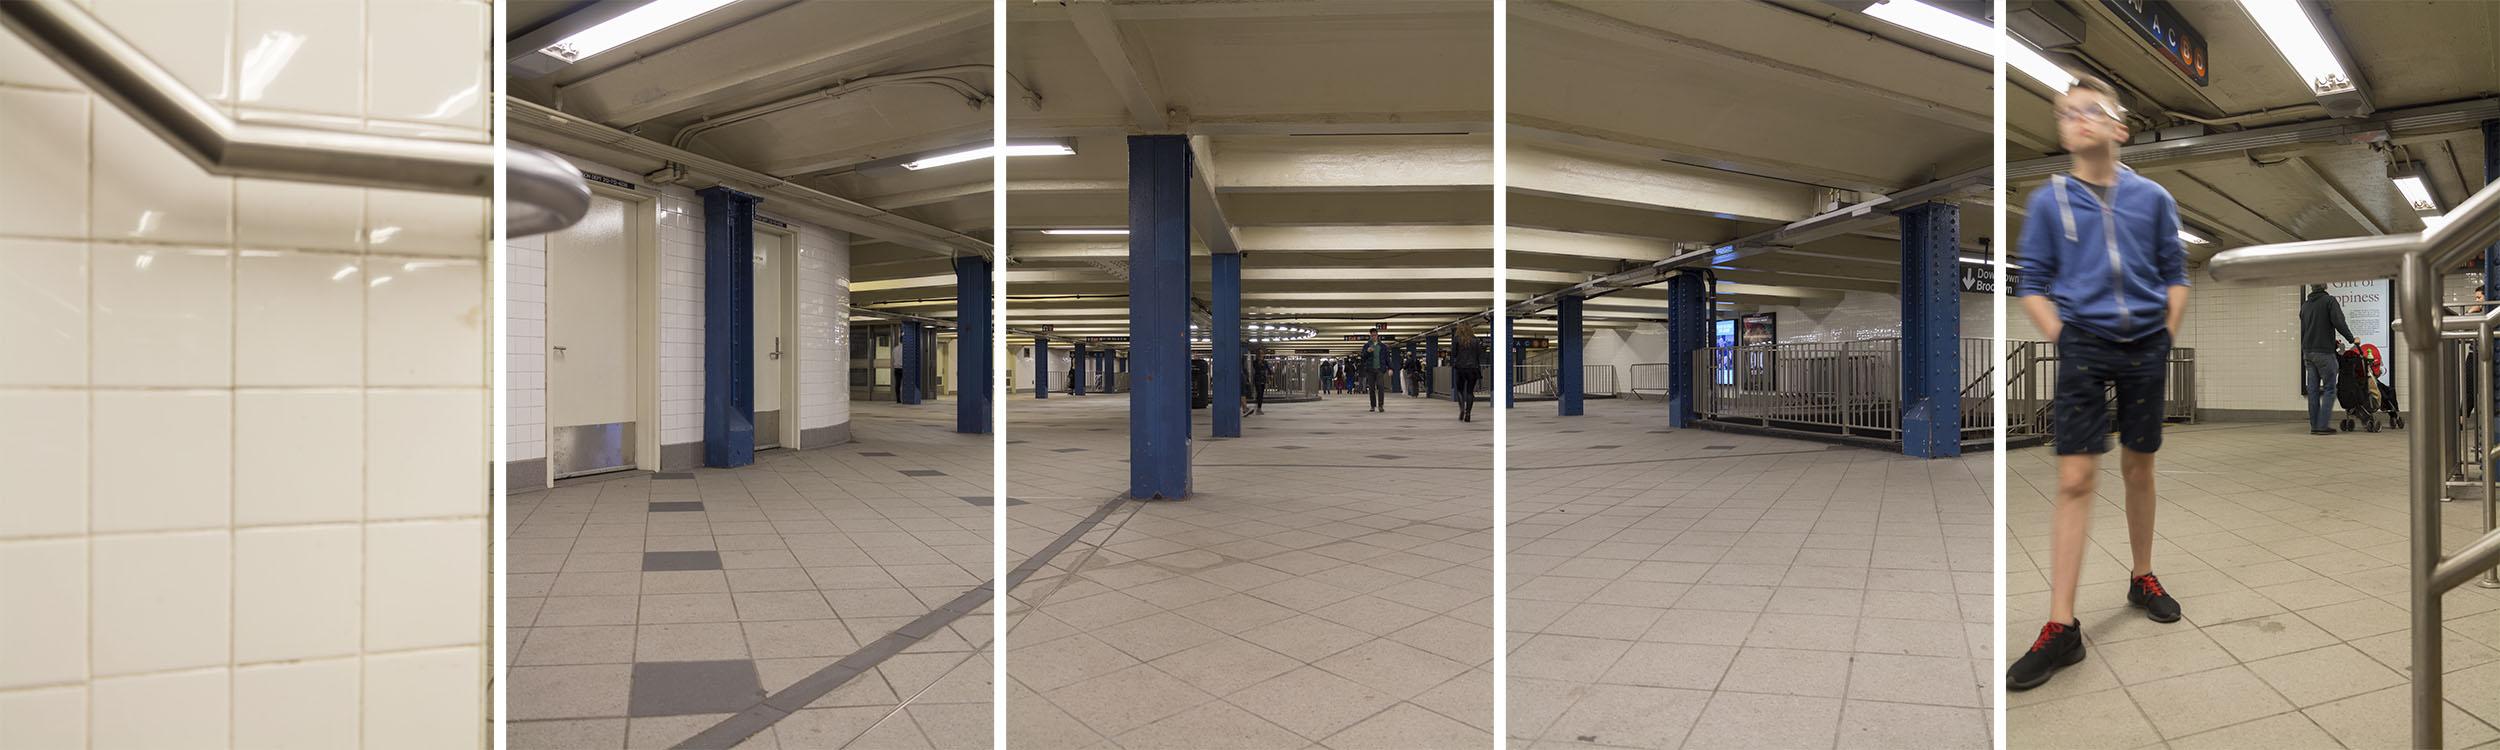 New York, Metro,4-19-2015,6921-6941